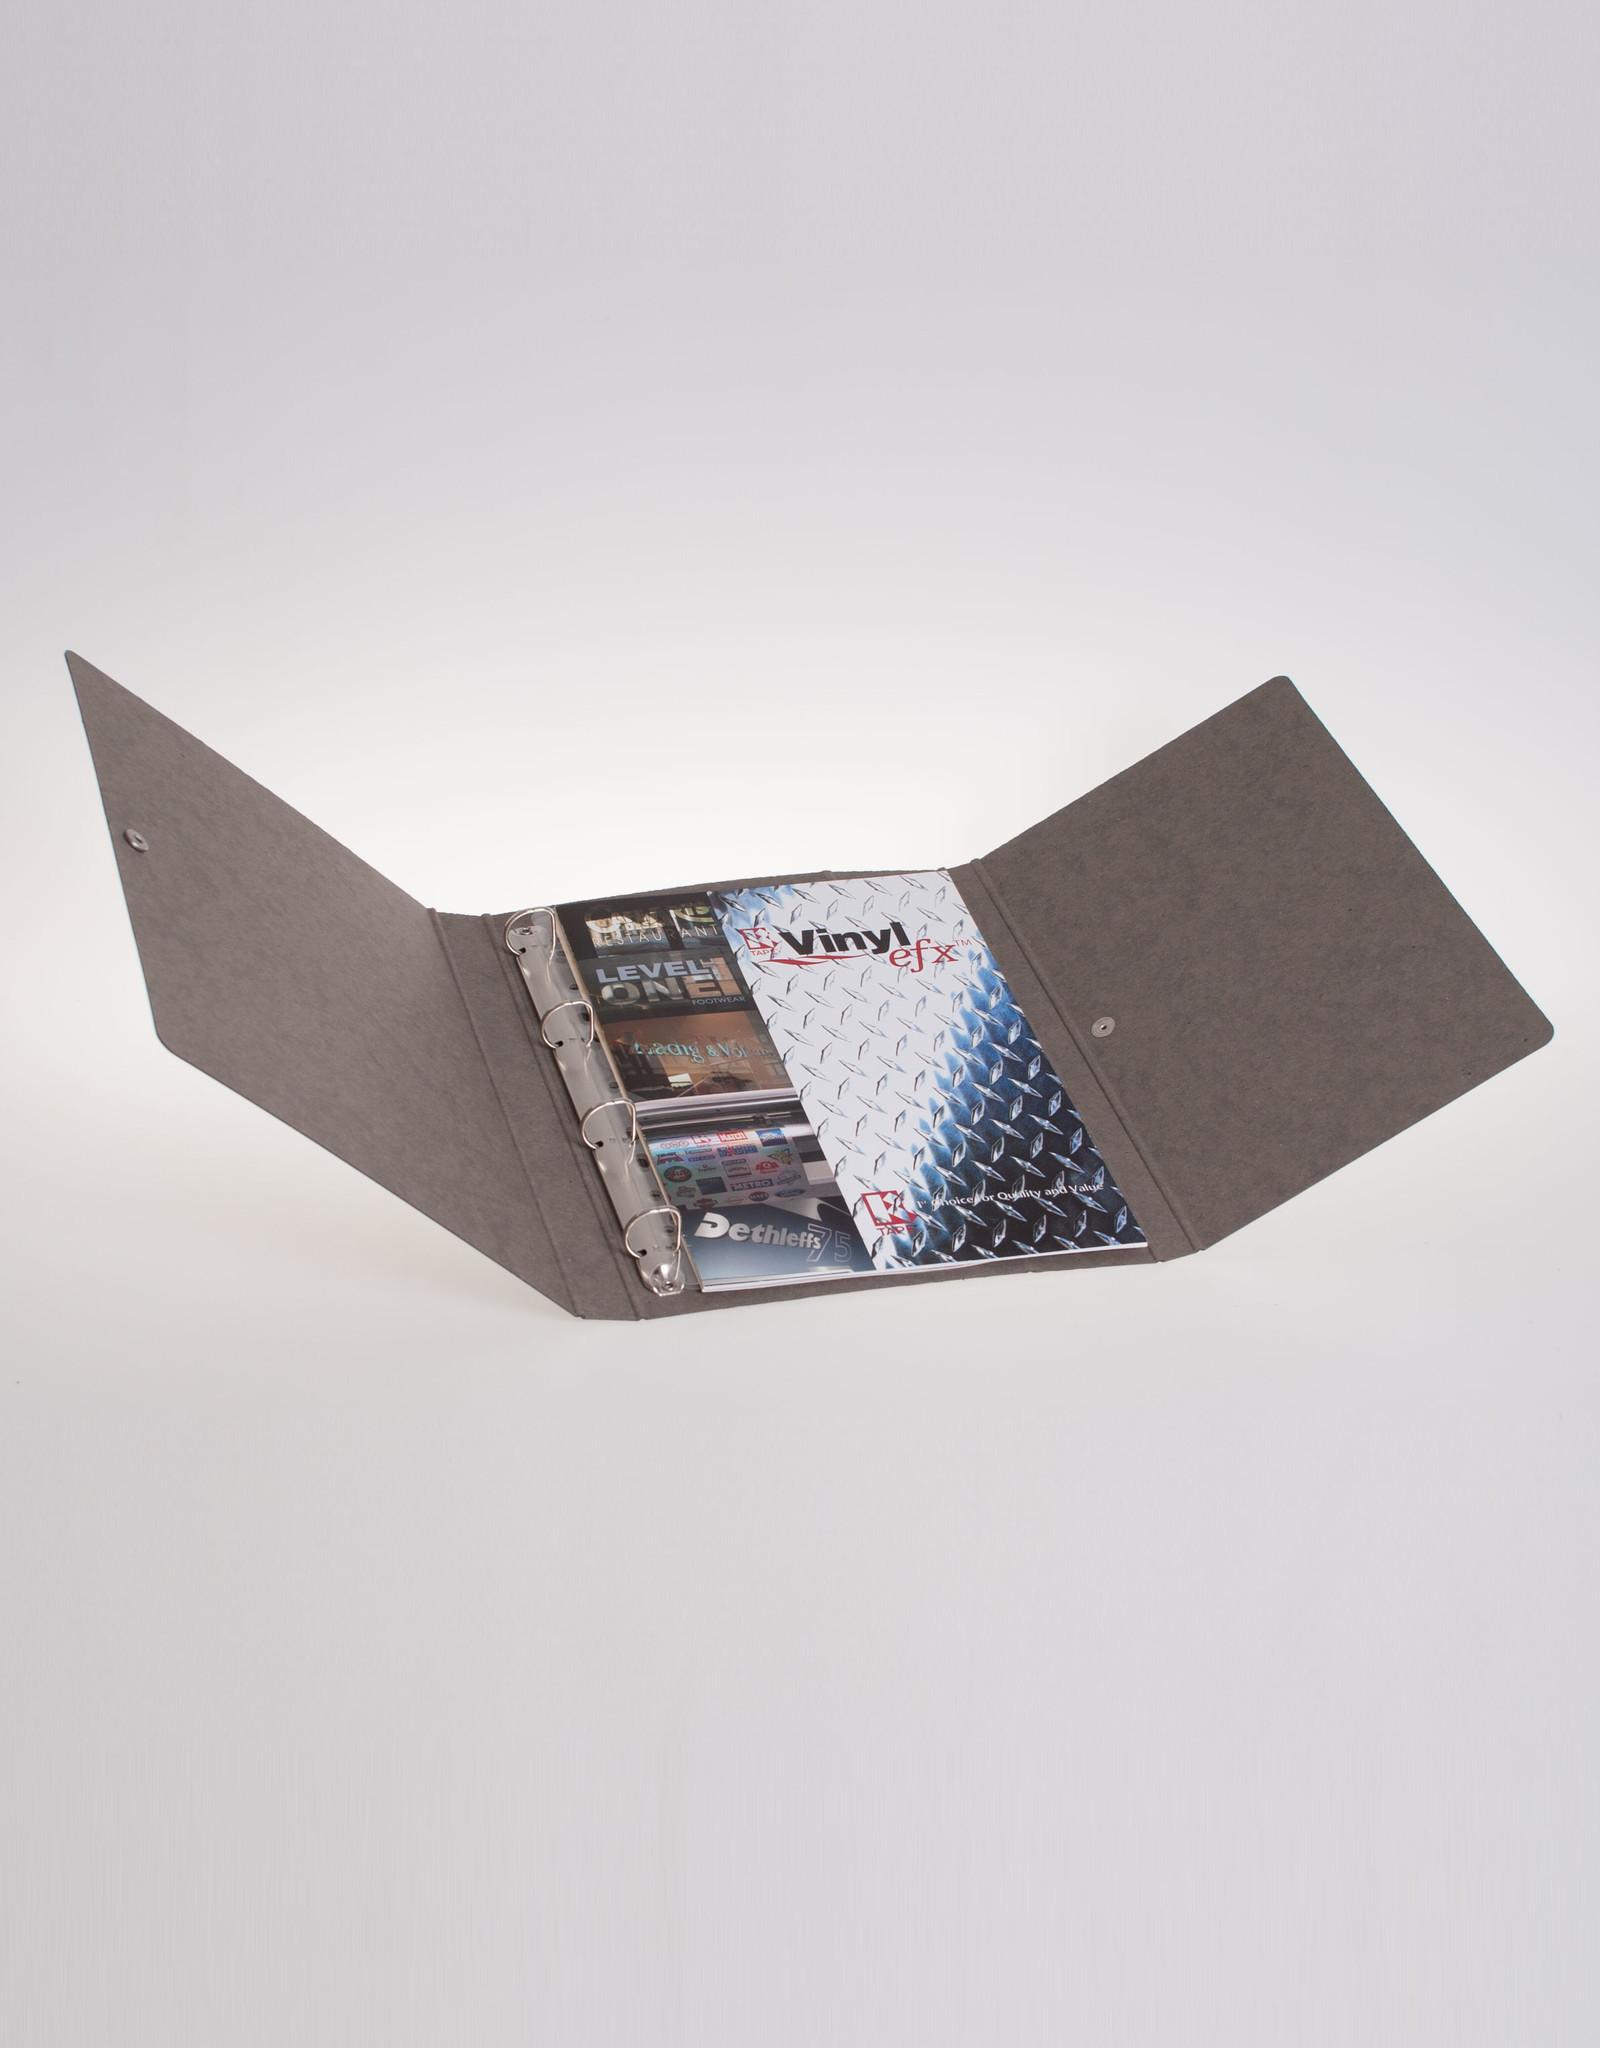 Ringband A4 met drukknoop, recycleboard grijs